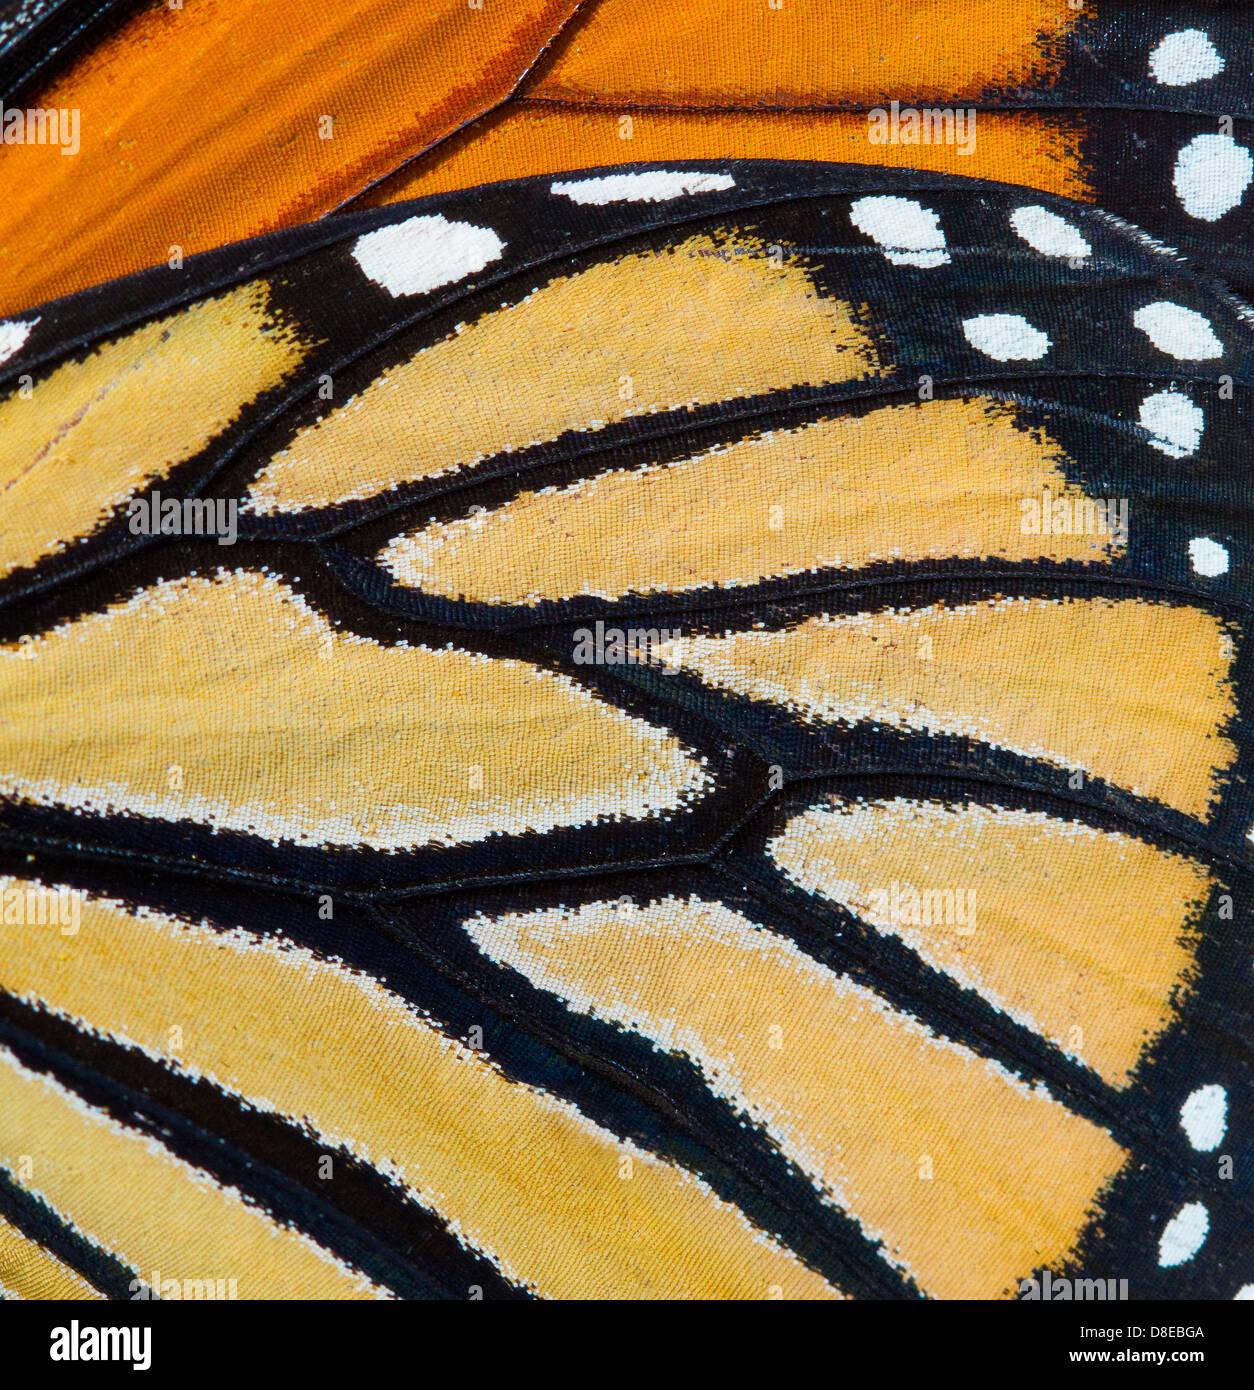 Mariposa monarca (Danaus plexippus) Detalle de ala, Florida, EE.UU.. Imagen De Stock